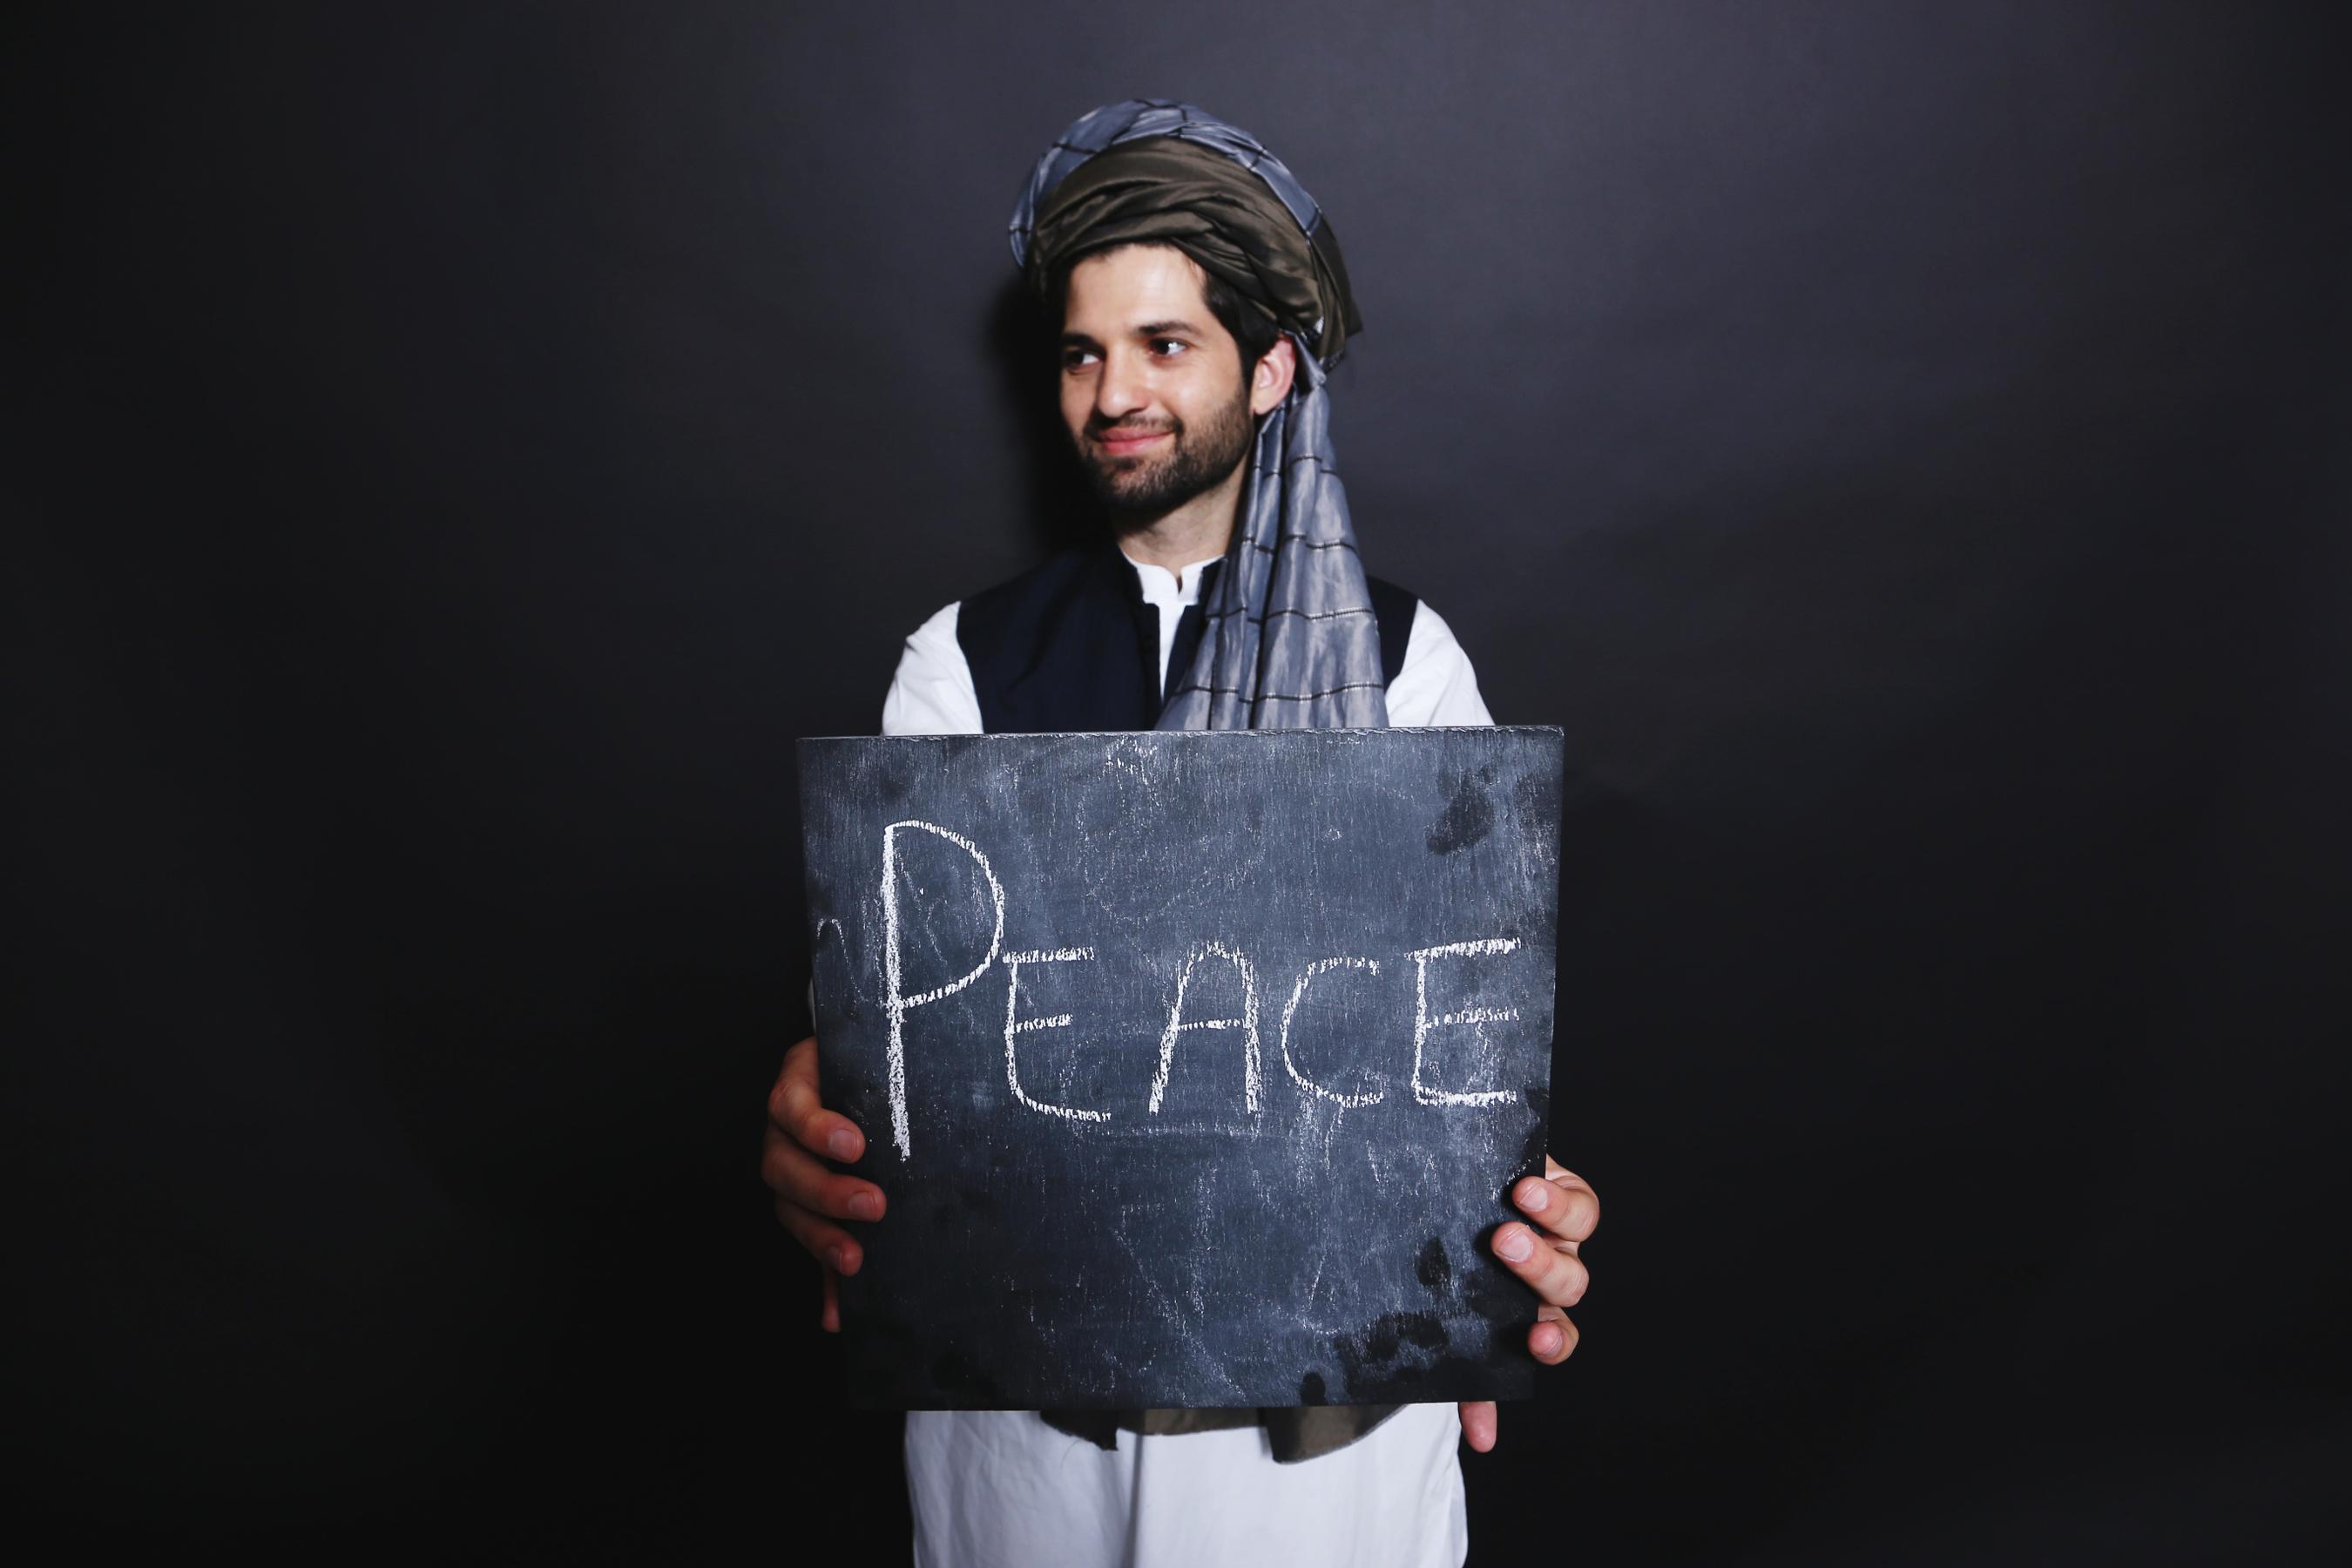 SPP student Ahmad Bashir at CEU International Cultural Festival, 2015. Image credit: CEU/Daniel Nemeth